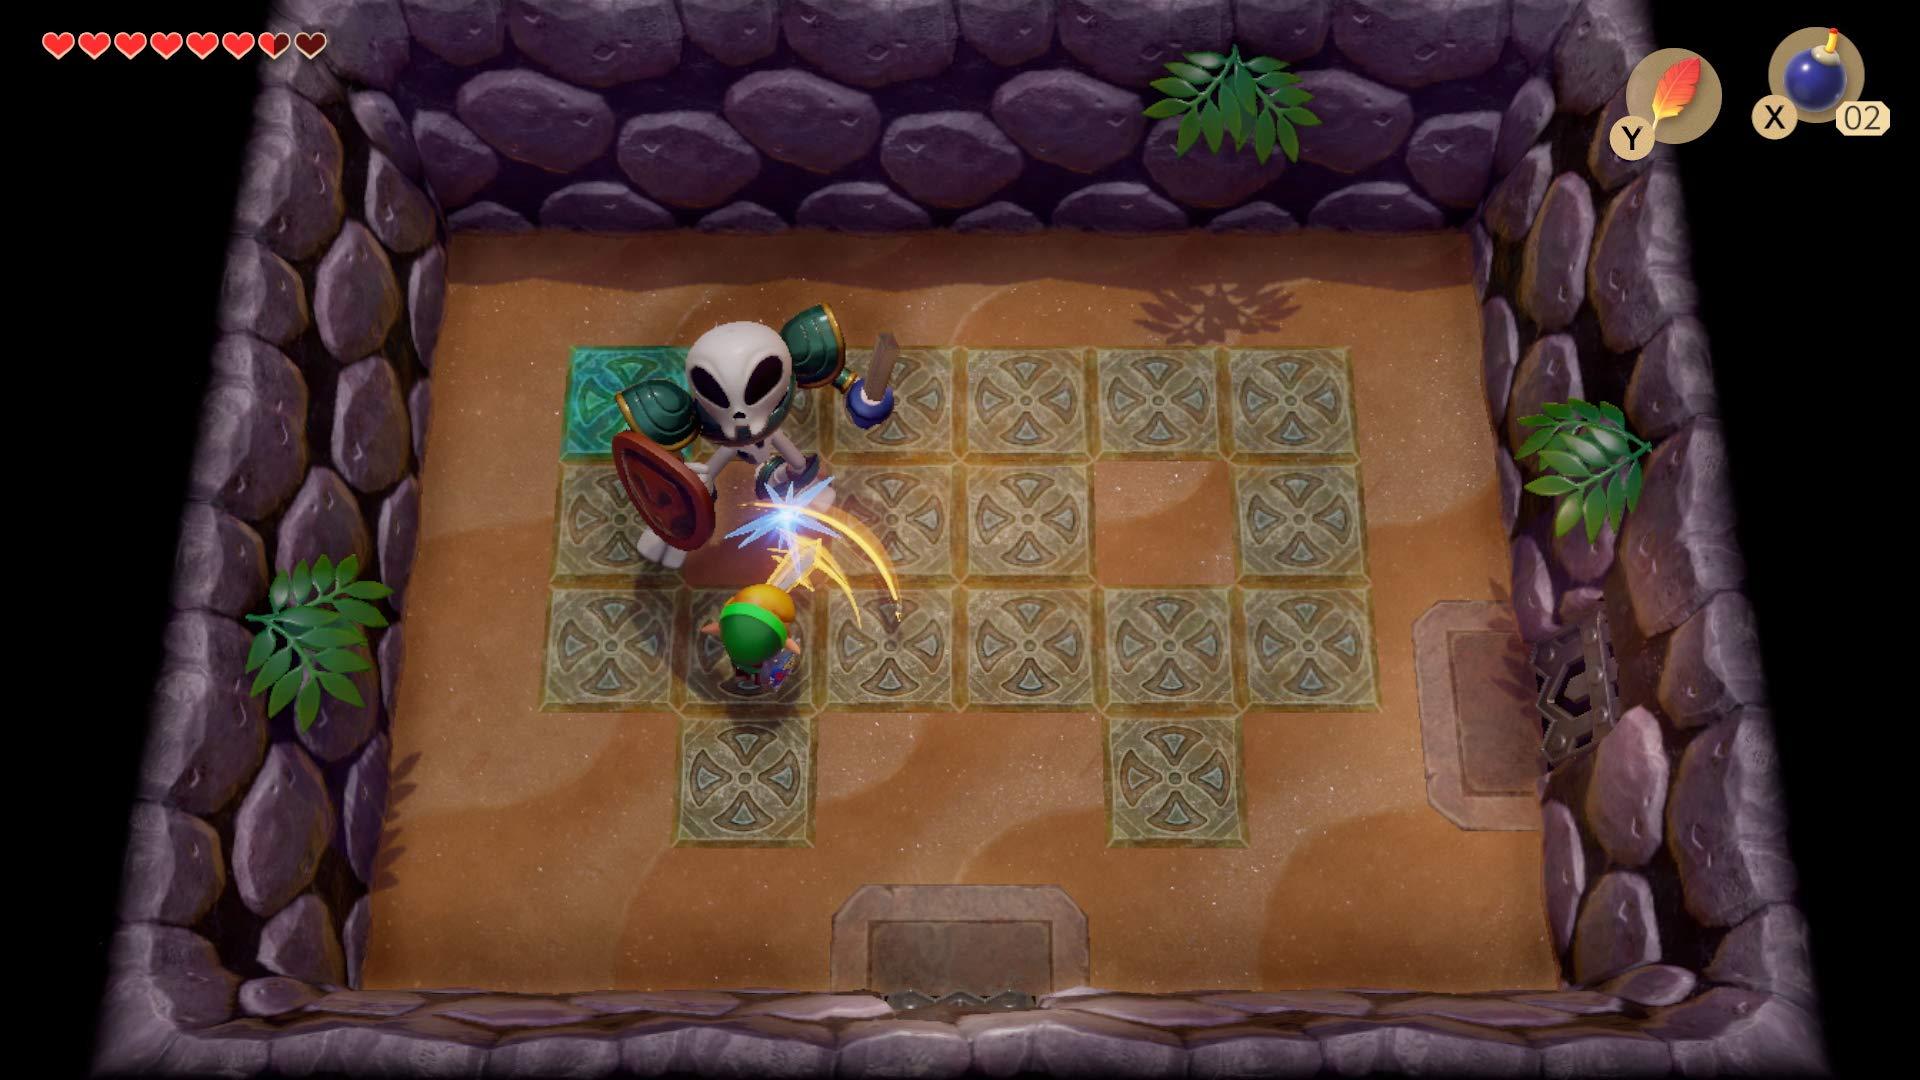 Legend of Zelda Link's Awakening - Nintendo Switch by Nintendo (Image #12)